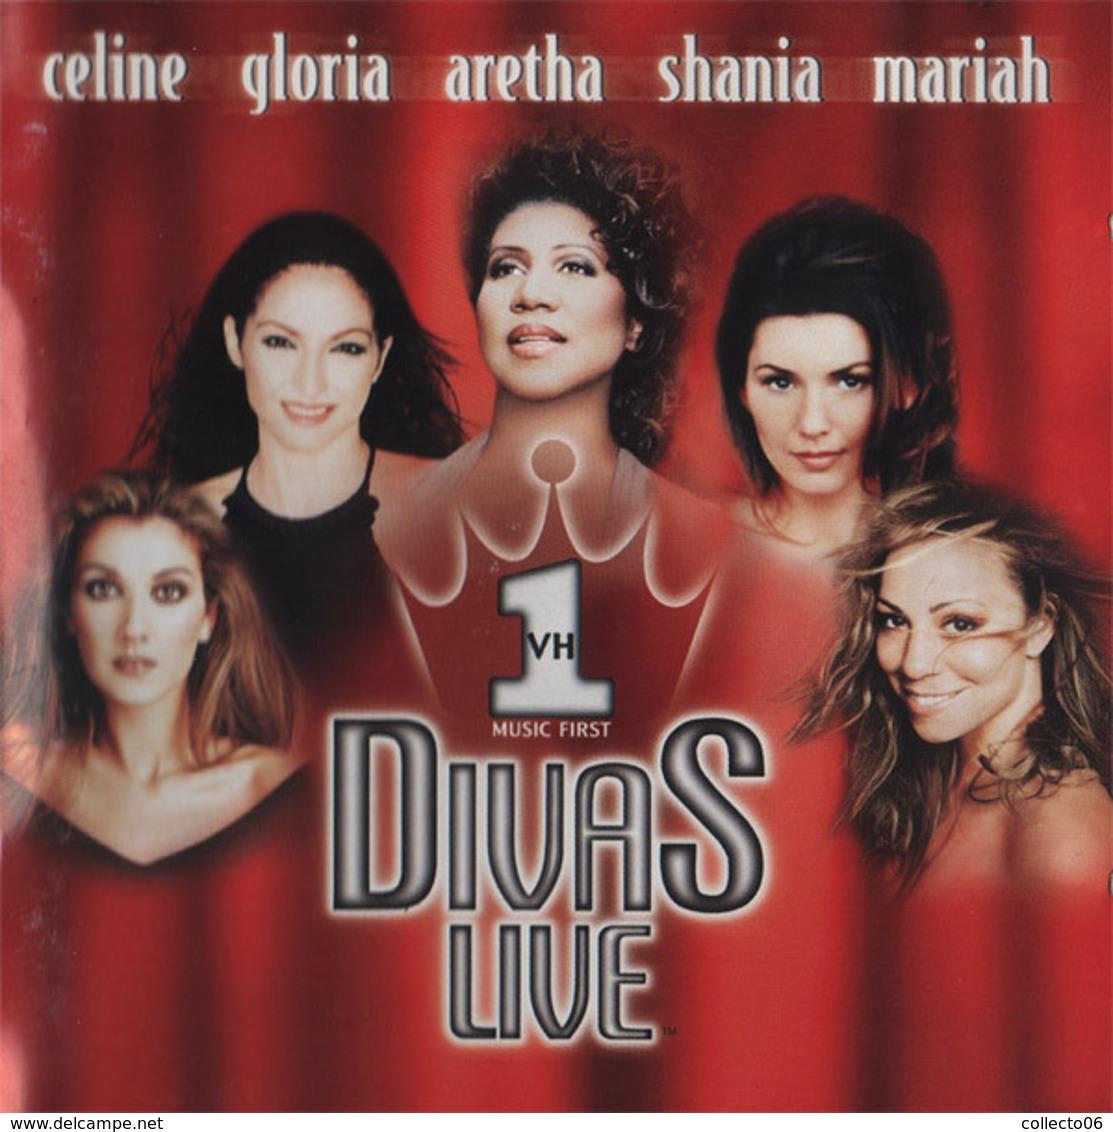 CD Divas Live Celine Dion Mariah Shania Aretha Gloria - Musik & Instrumente